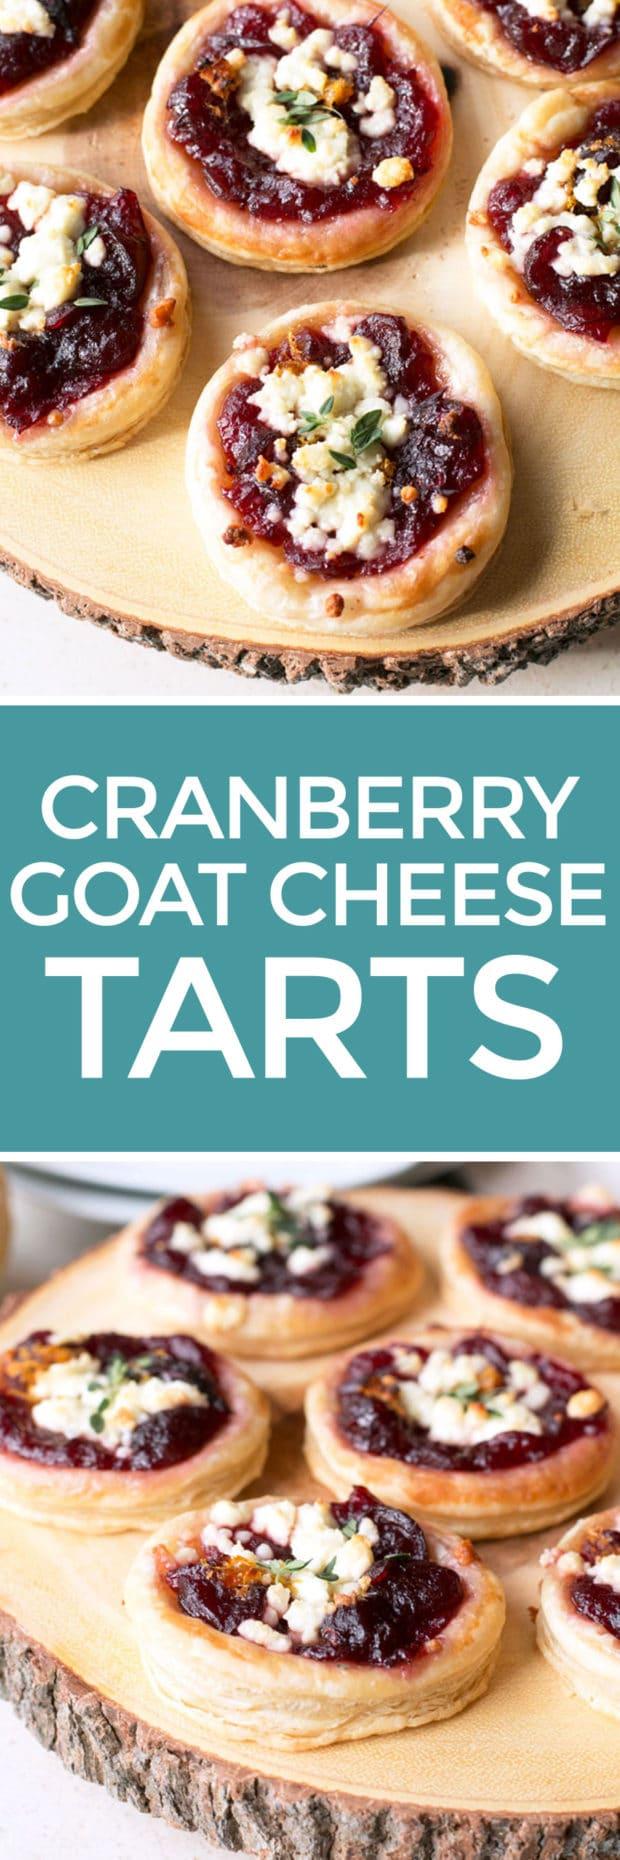 Cranberry Goat Cheese Tarts | cakenknife.com